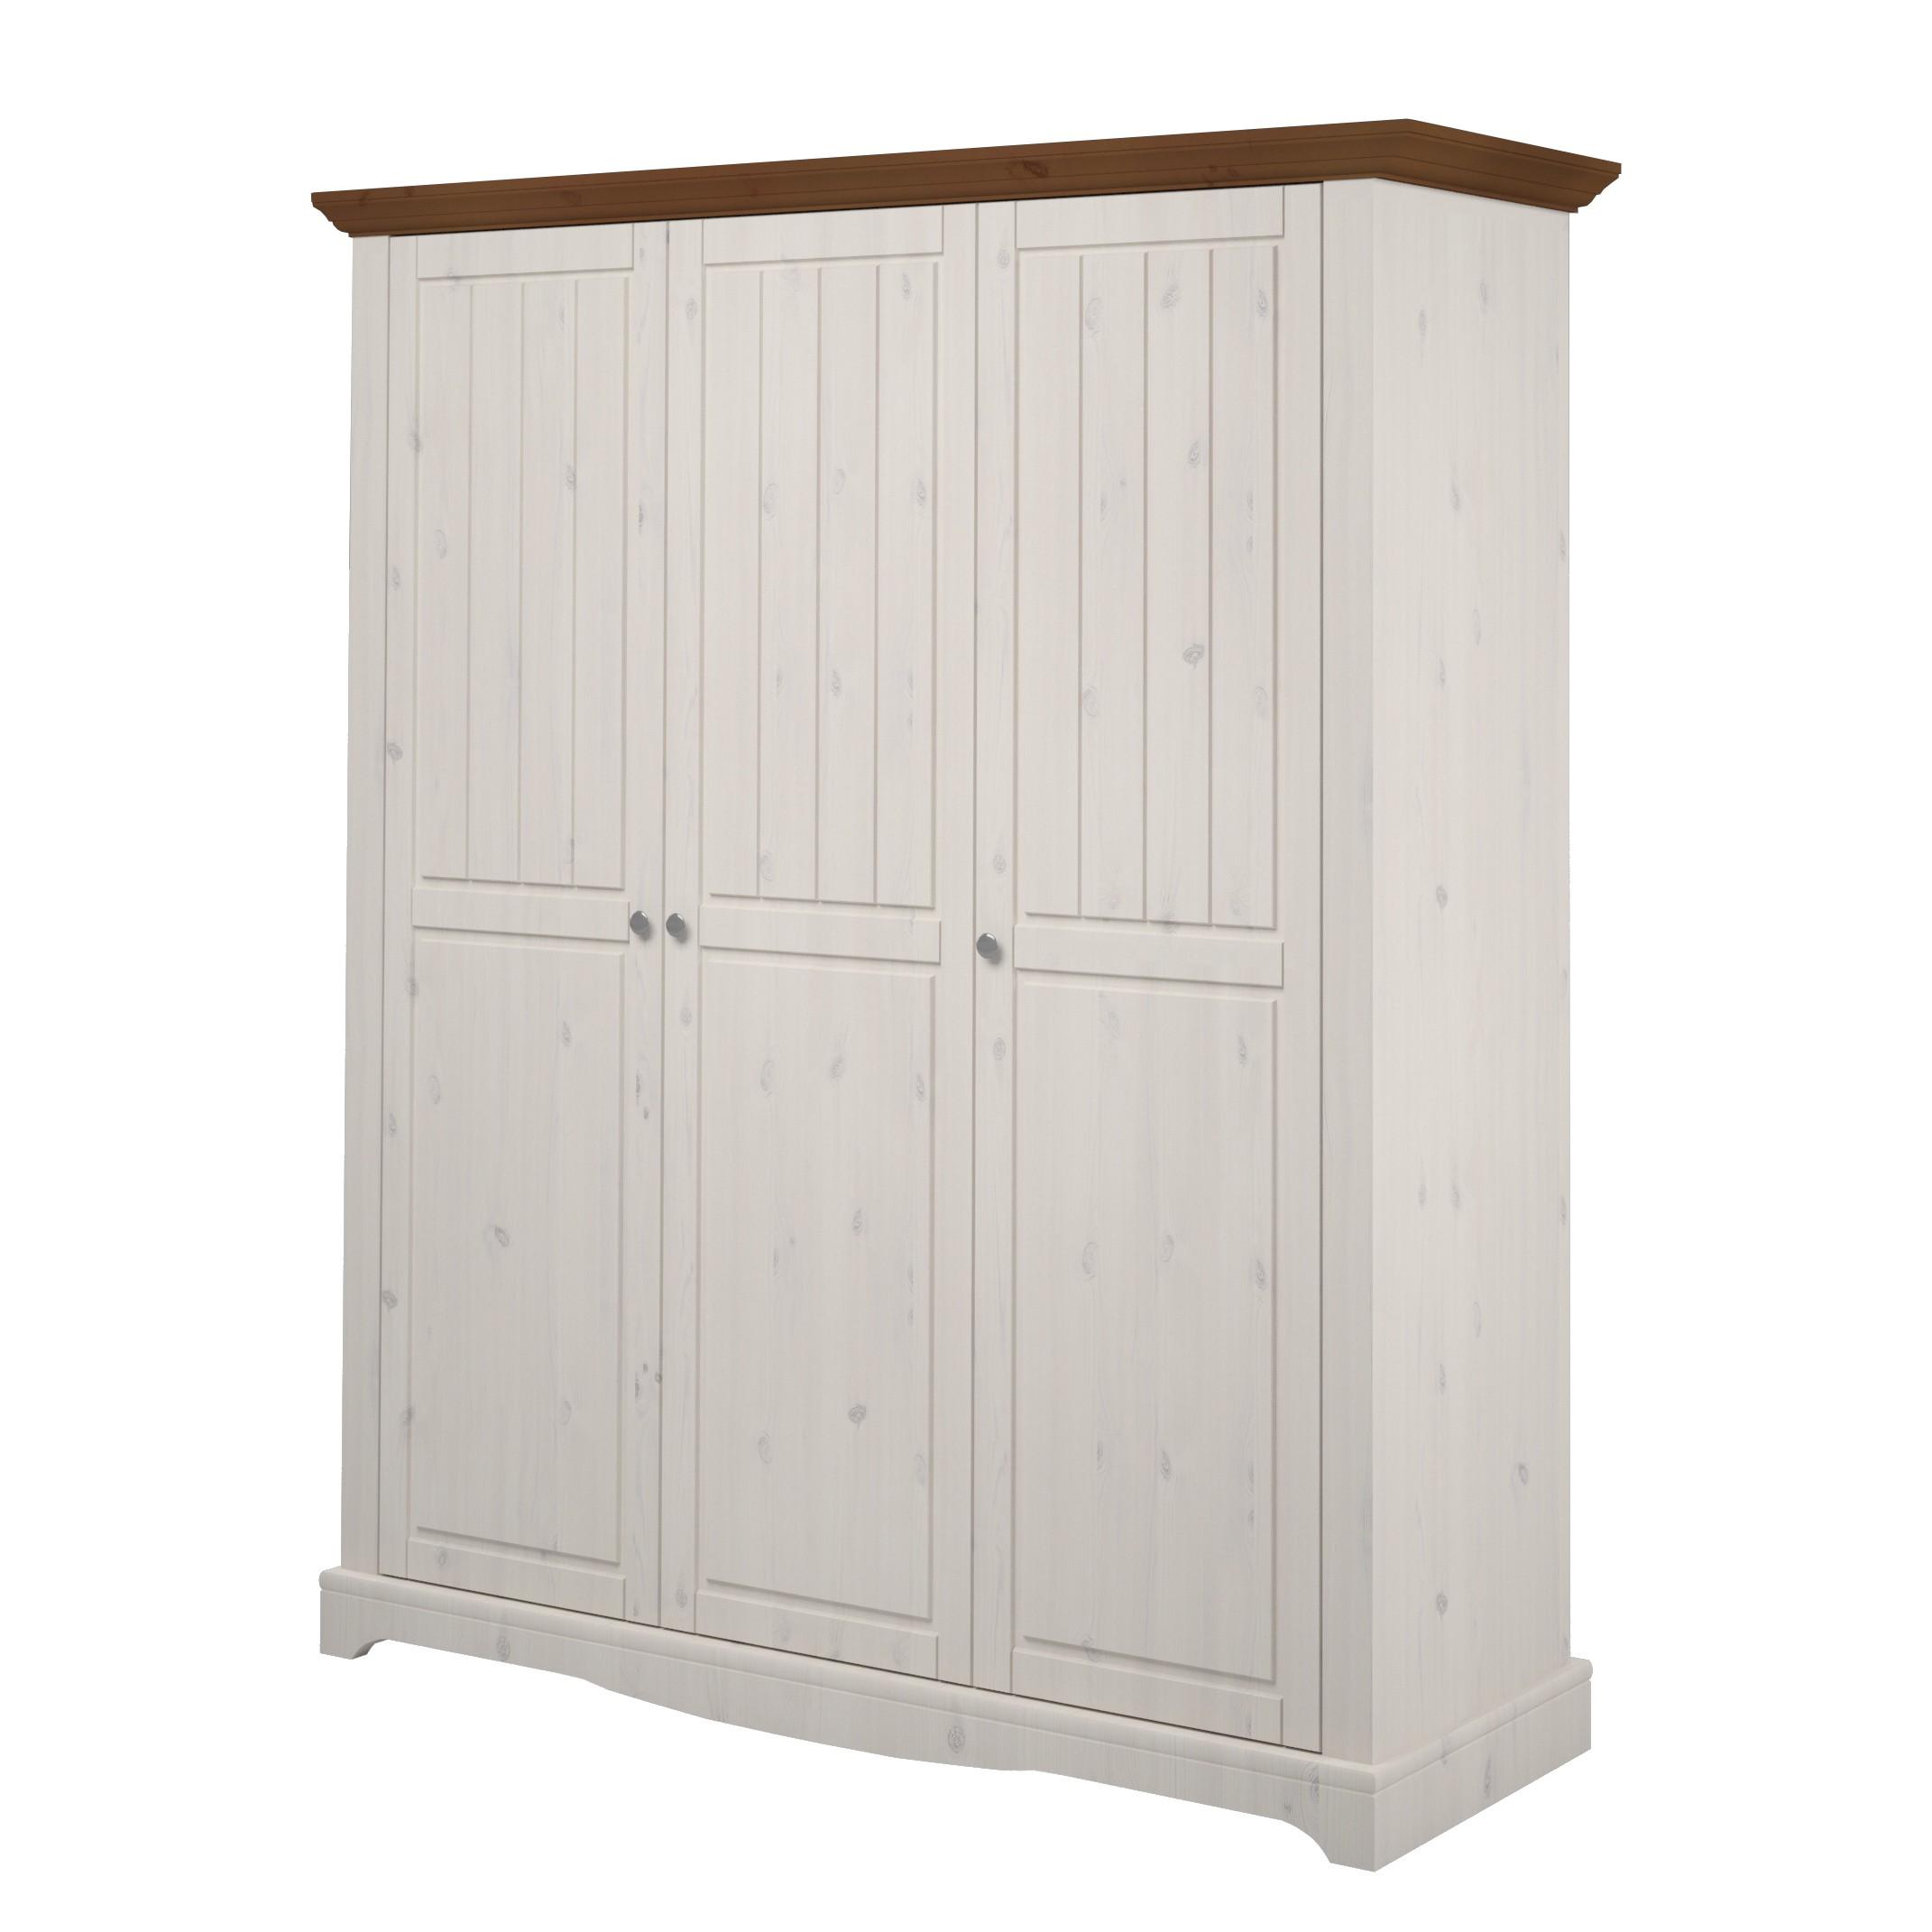 Kledingkast Karlotta 3 deurs   grenenhout white wash   White Washed provence_ Steens